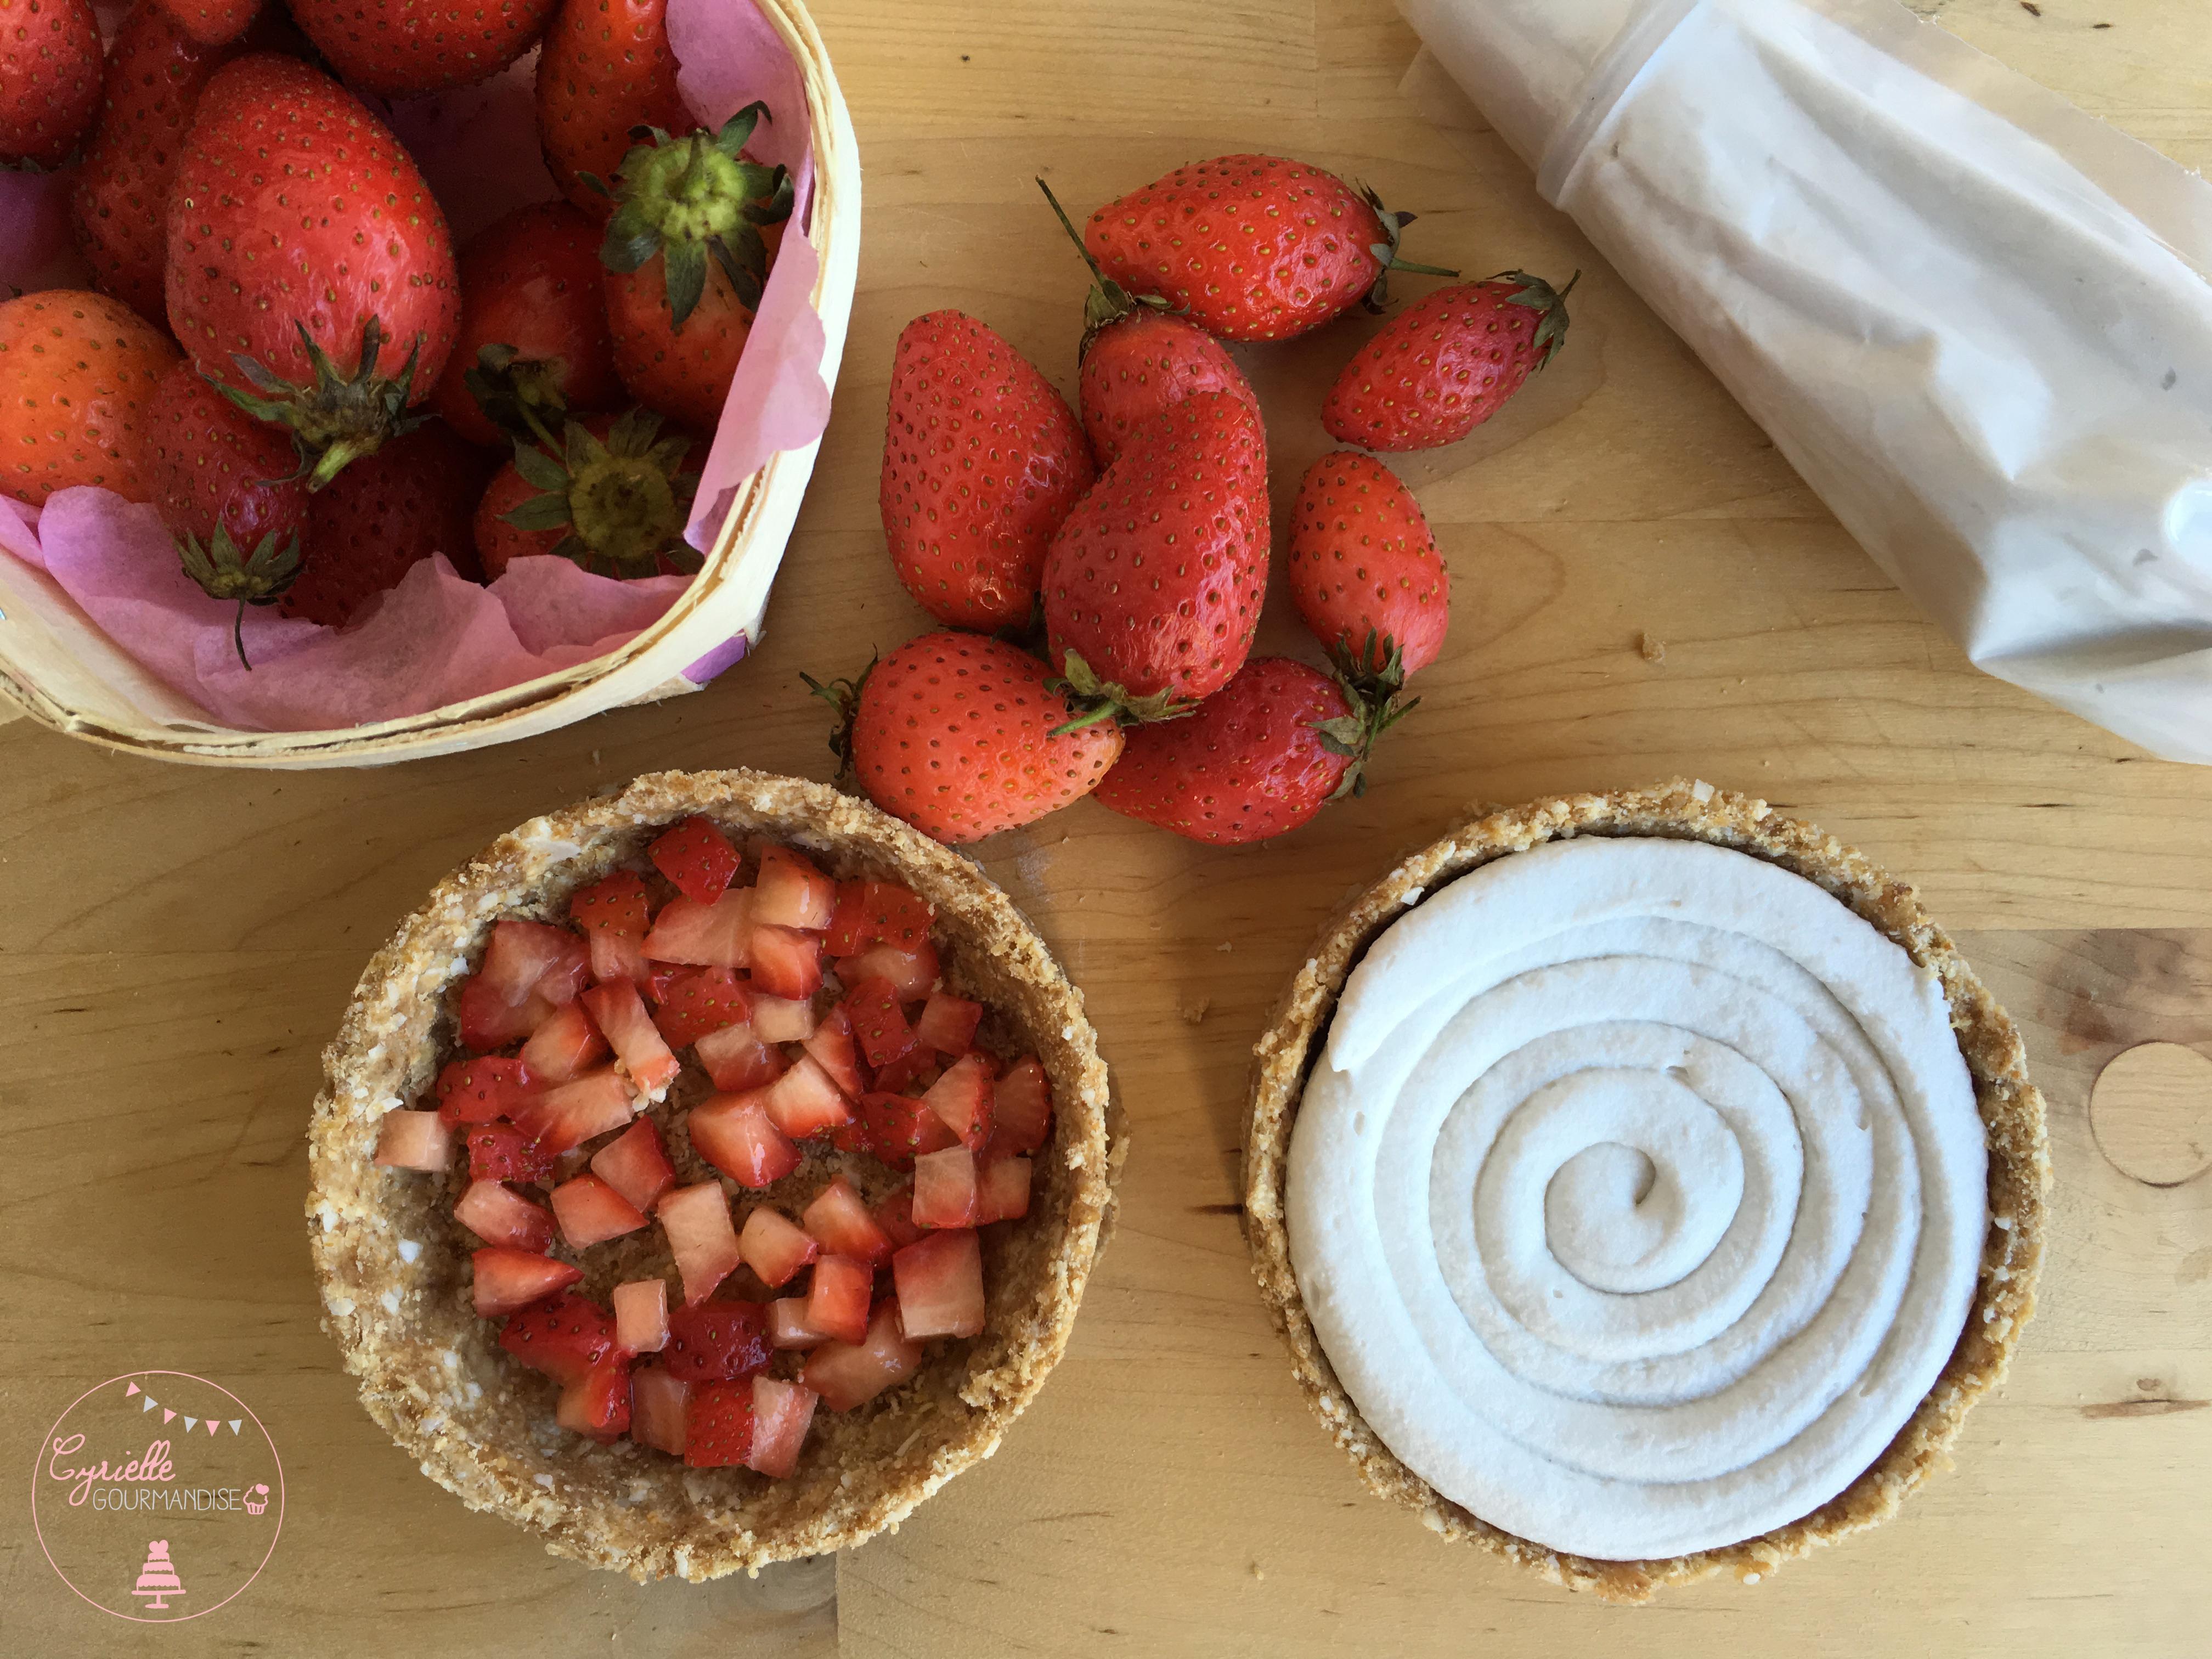 Tarte fraises crue - montage